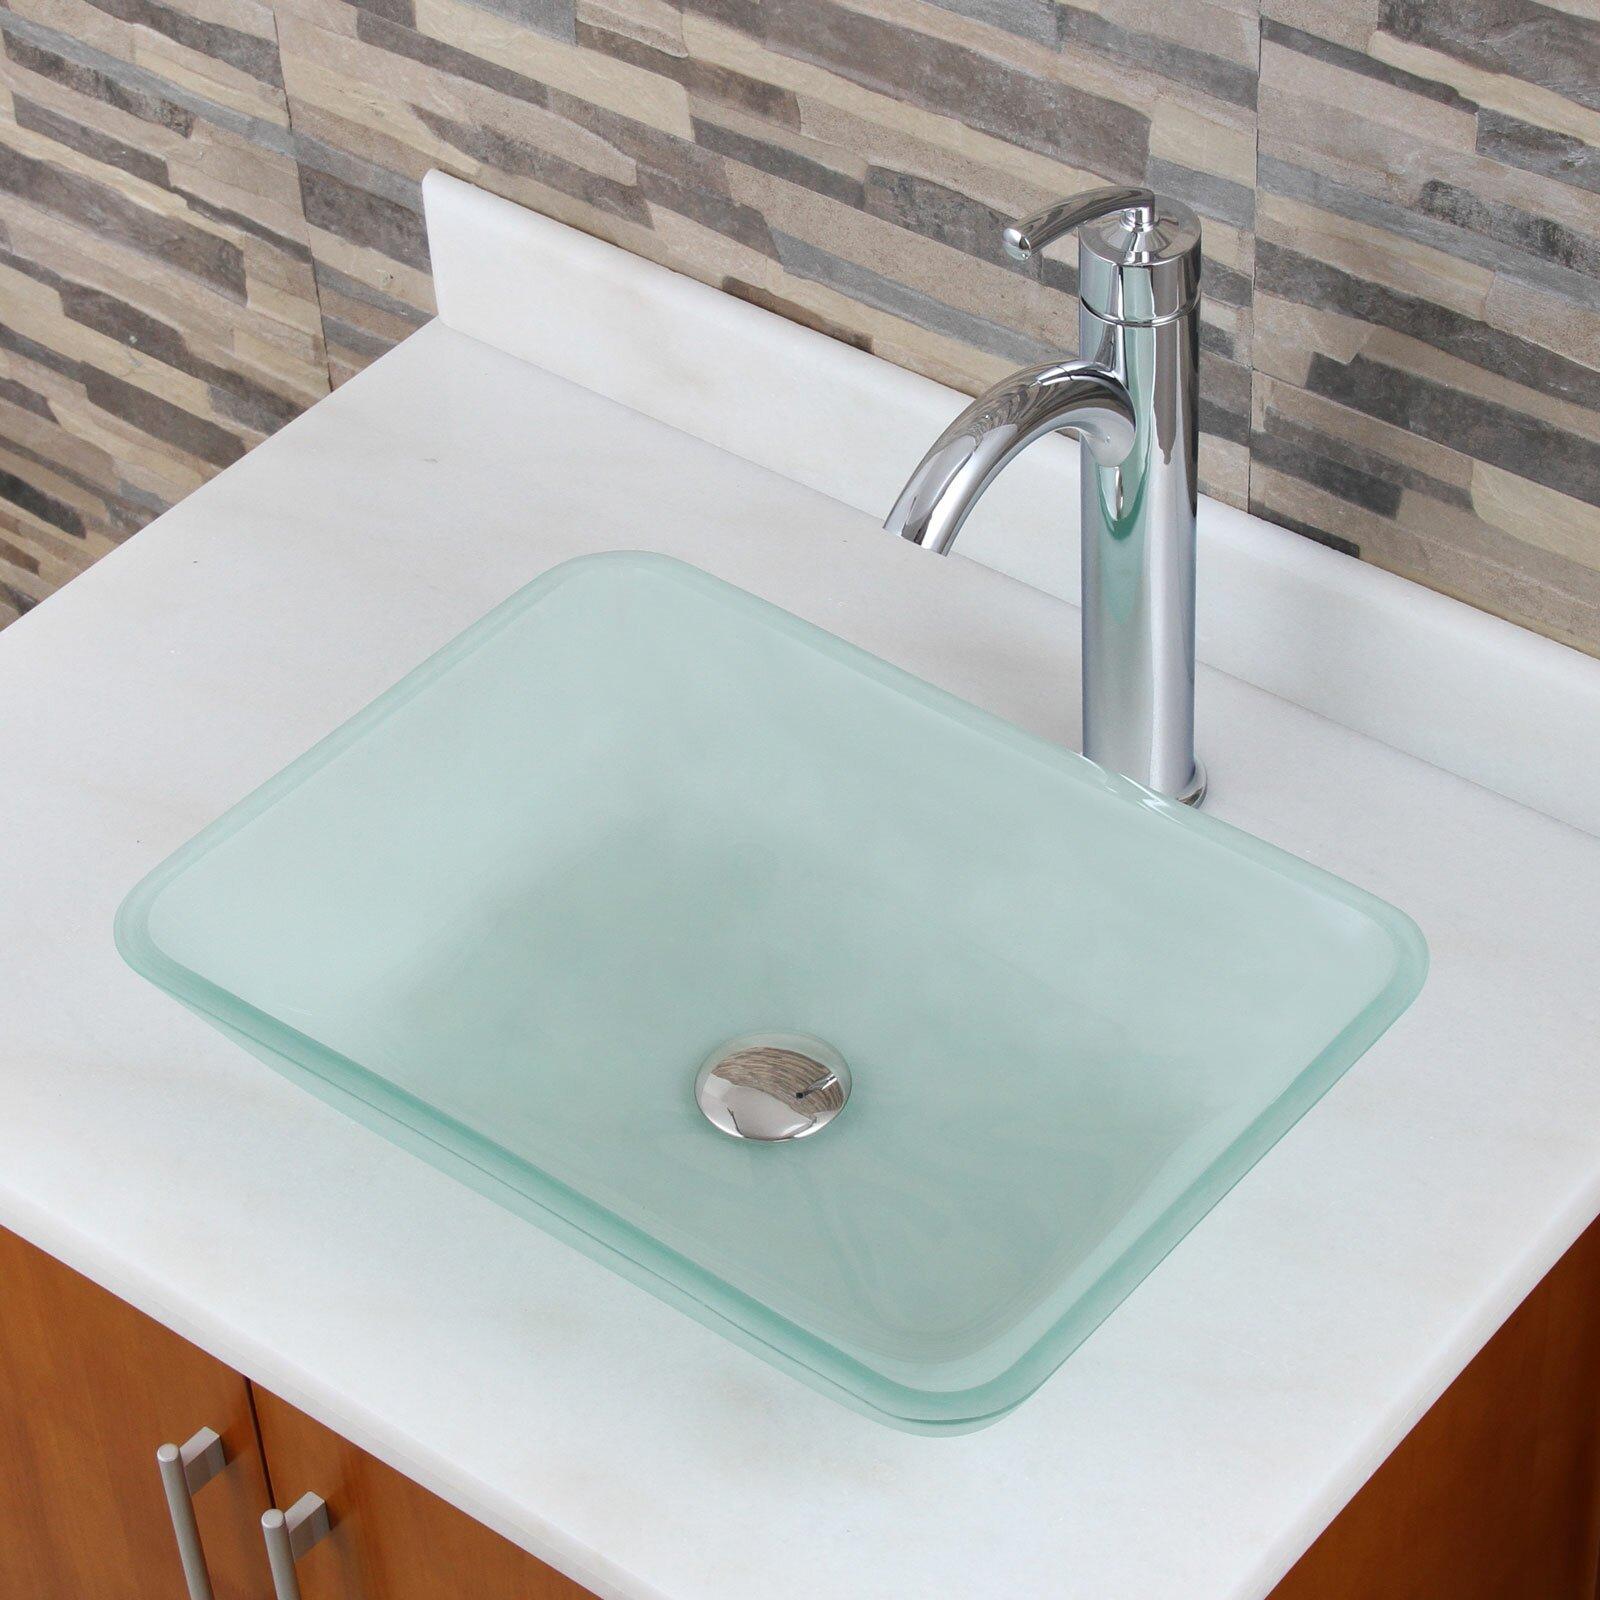 Rectangular Glass Vessel Sink : ... Tempered Rectangular Glass Vessel Bathroom Sink & Reviews Wayfair